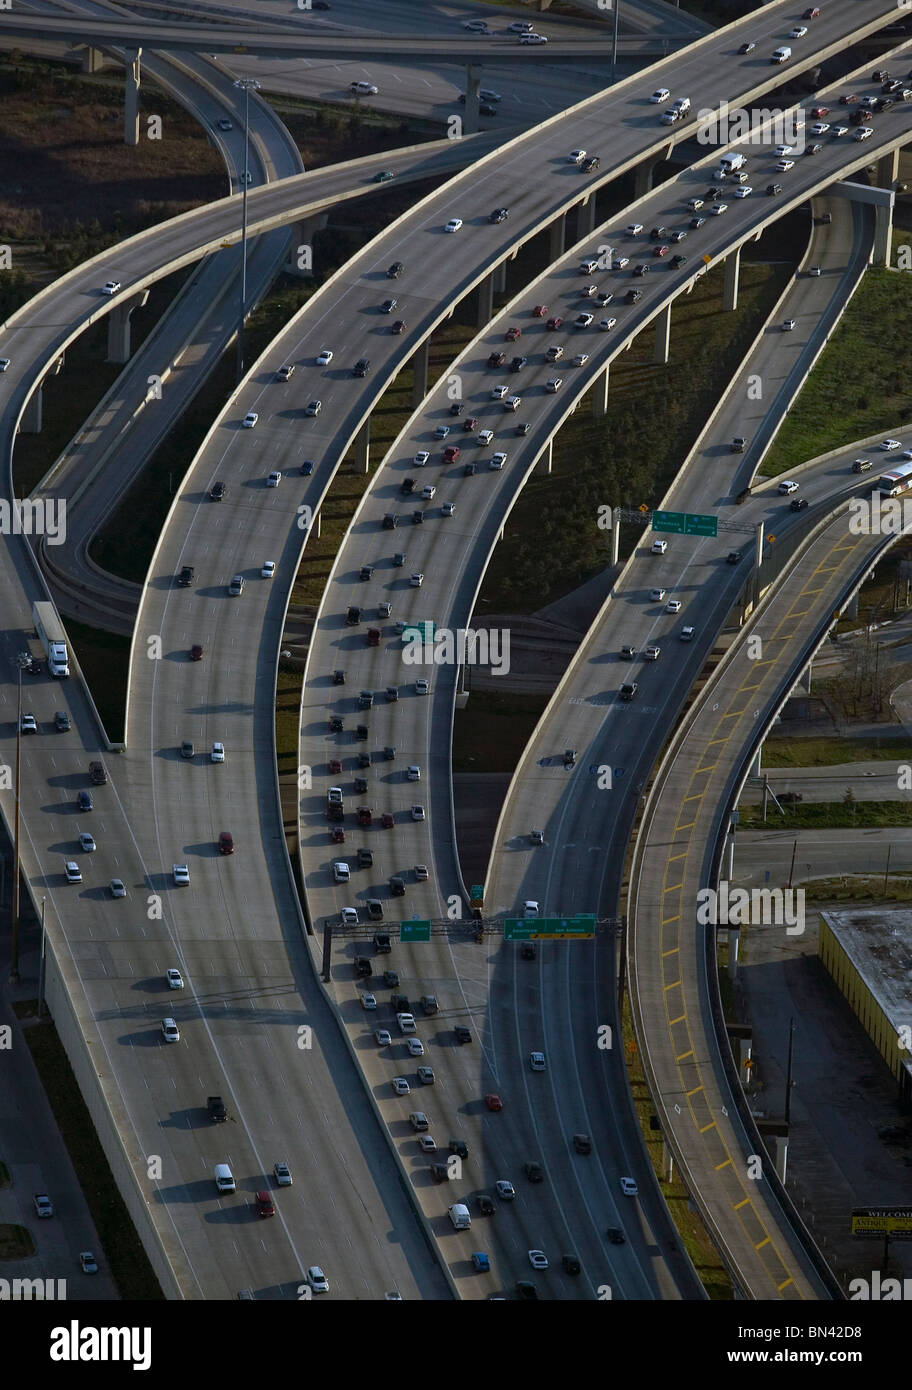 Luftbild oben schweren s Automobil Trafffic Freeway Houston Texas Stockbild